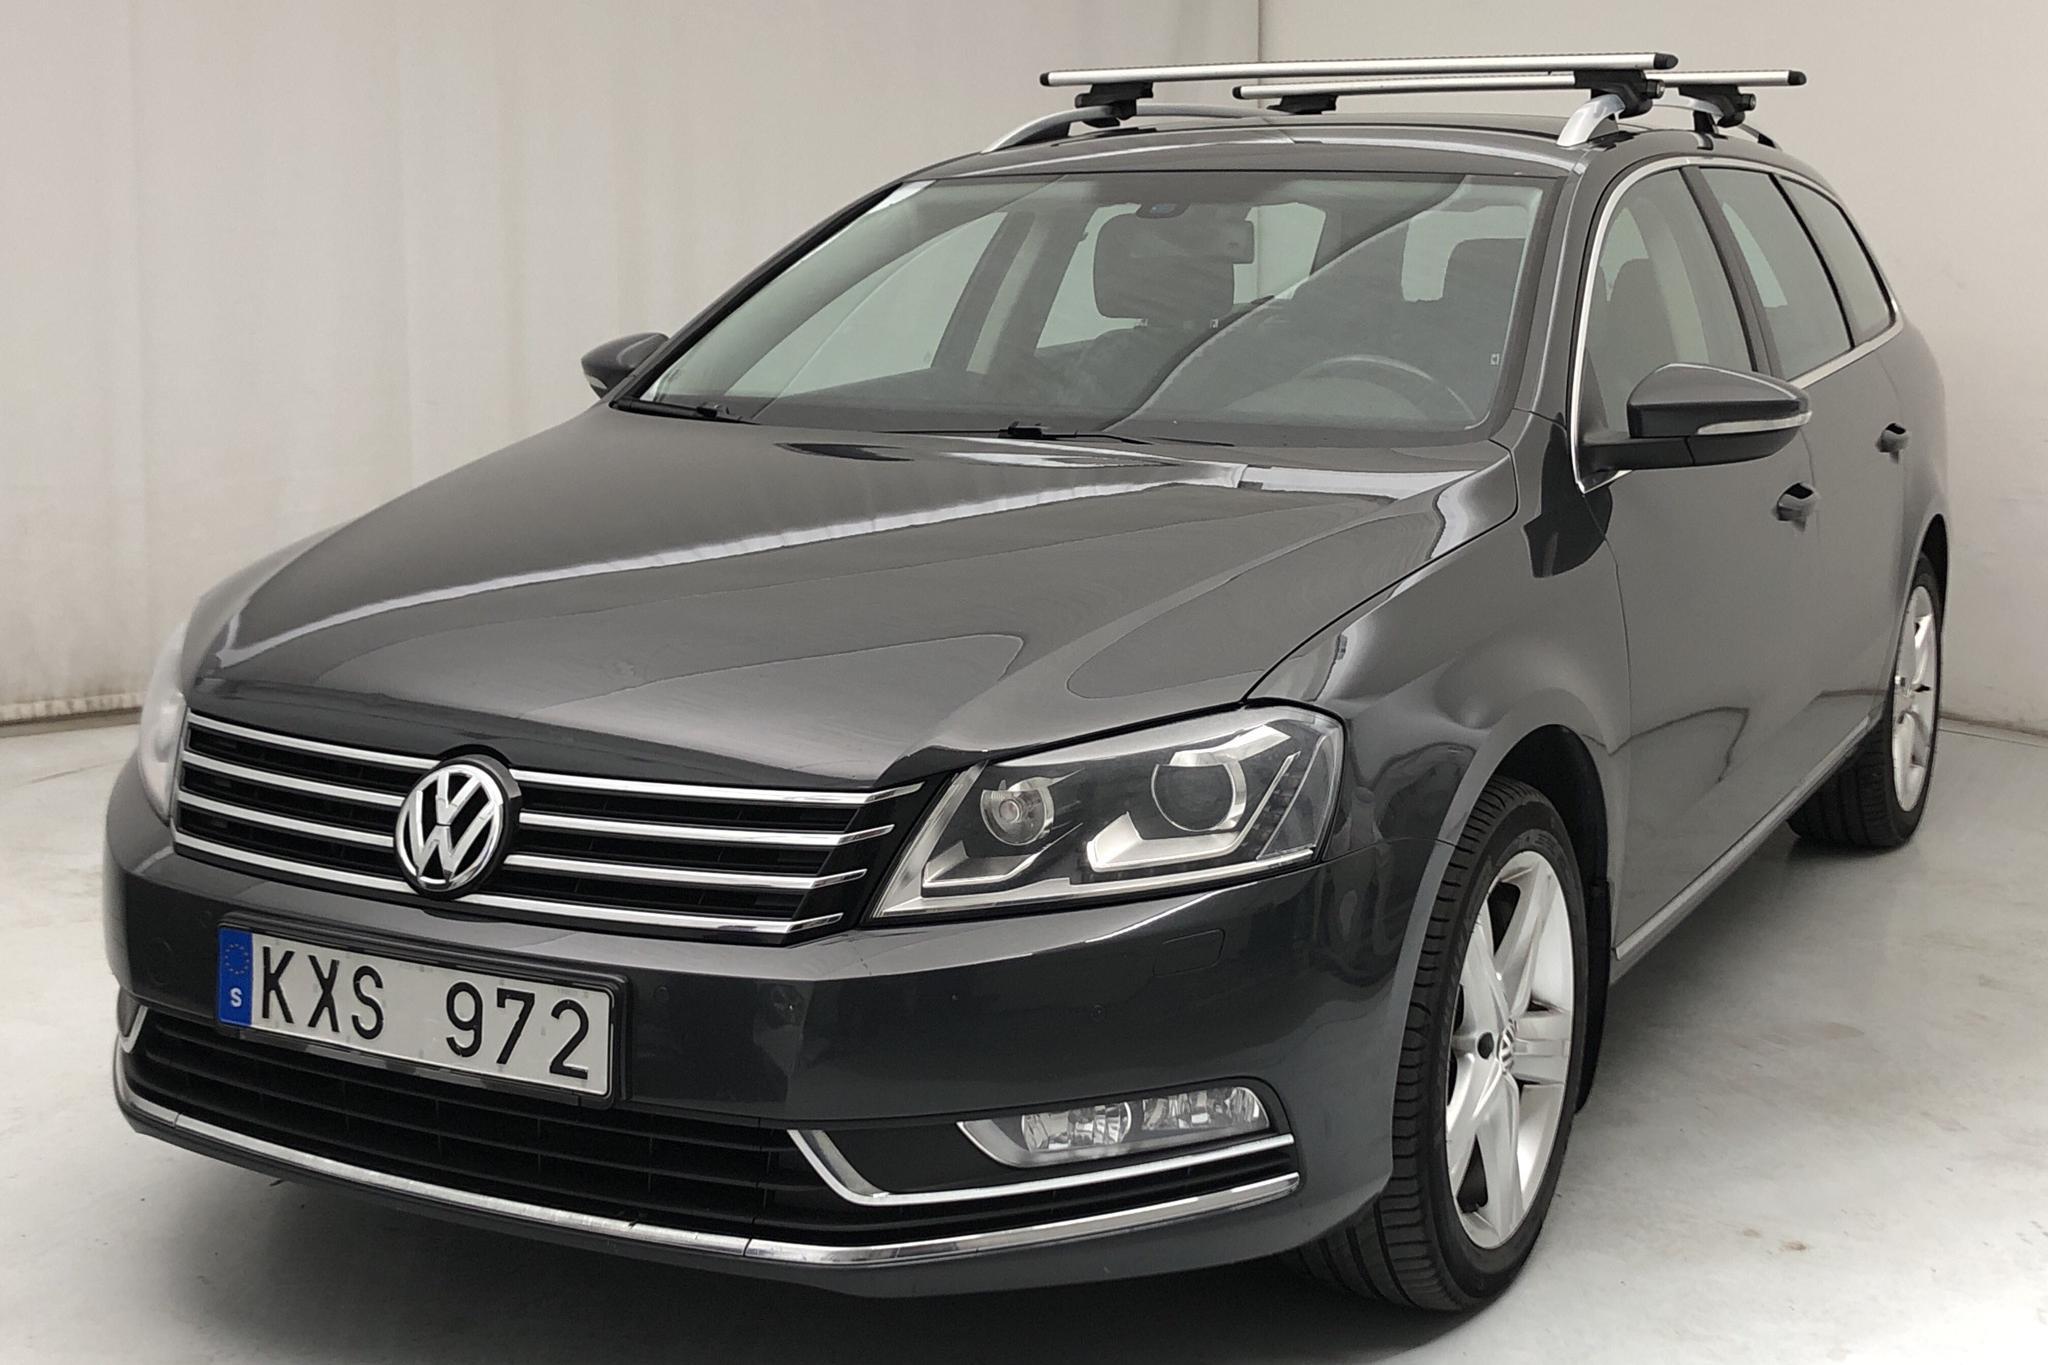 VW Passat 1.4 TSI EcoFuel Variant (150hk) - 21 807 mil - Manuell - Dark Grey - 2013